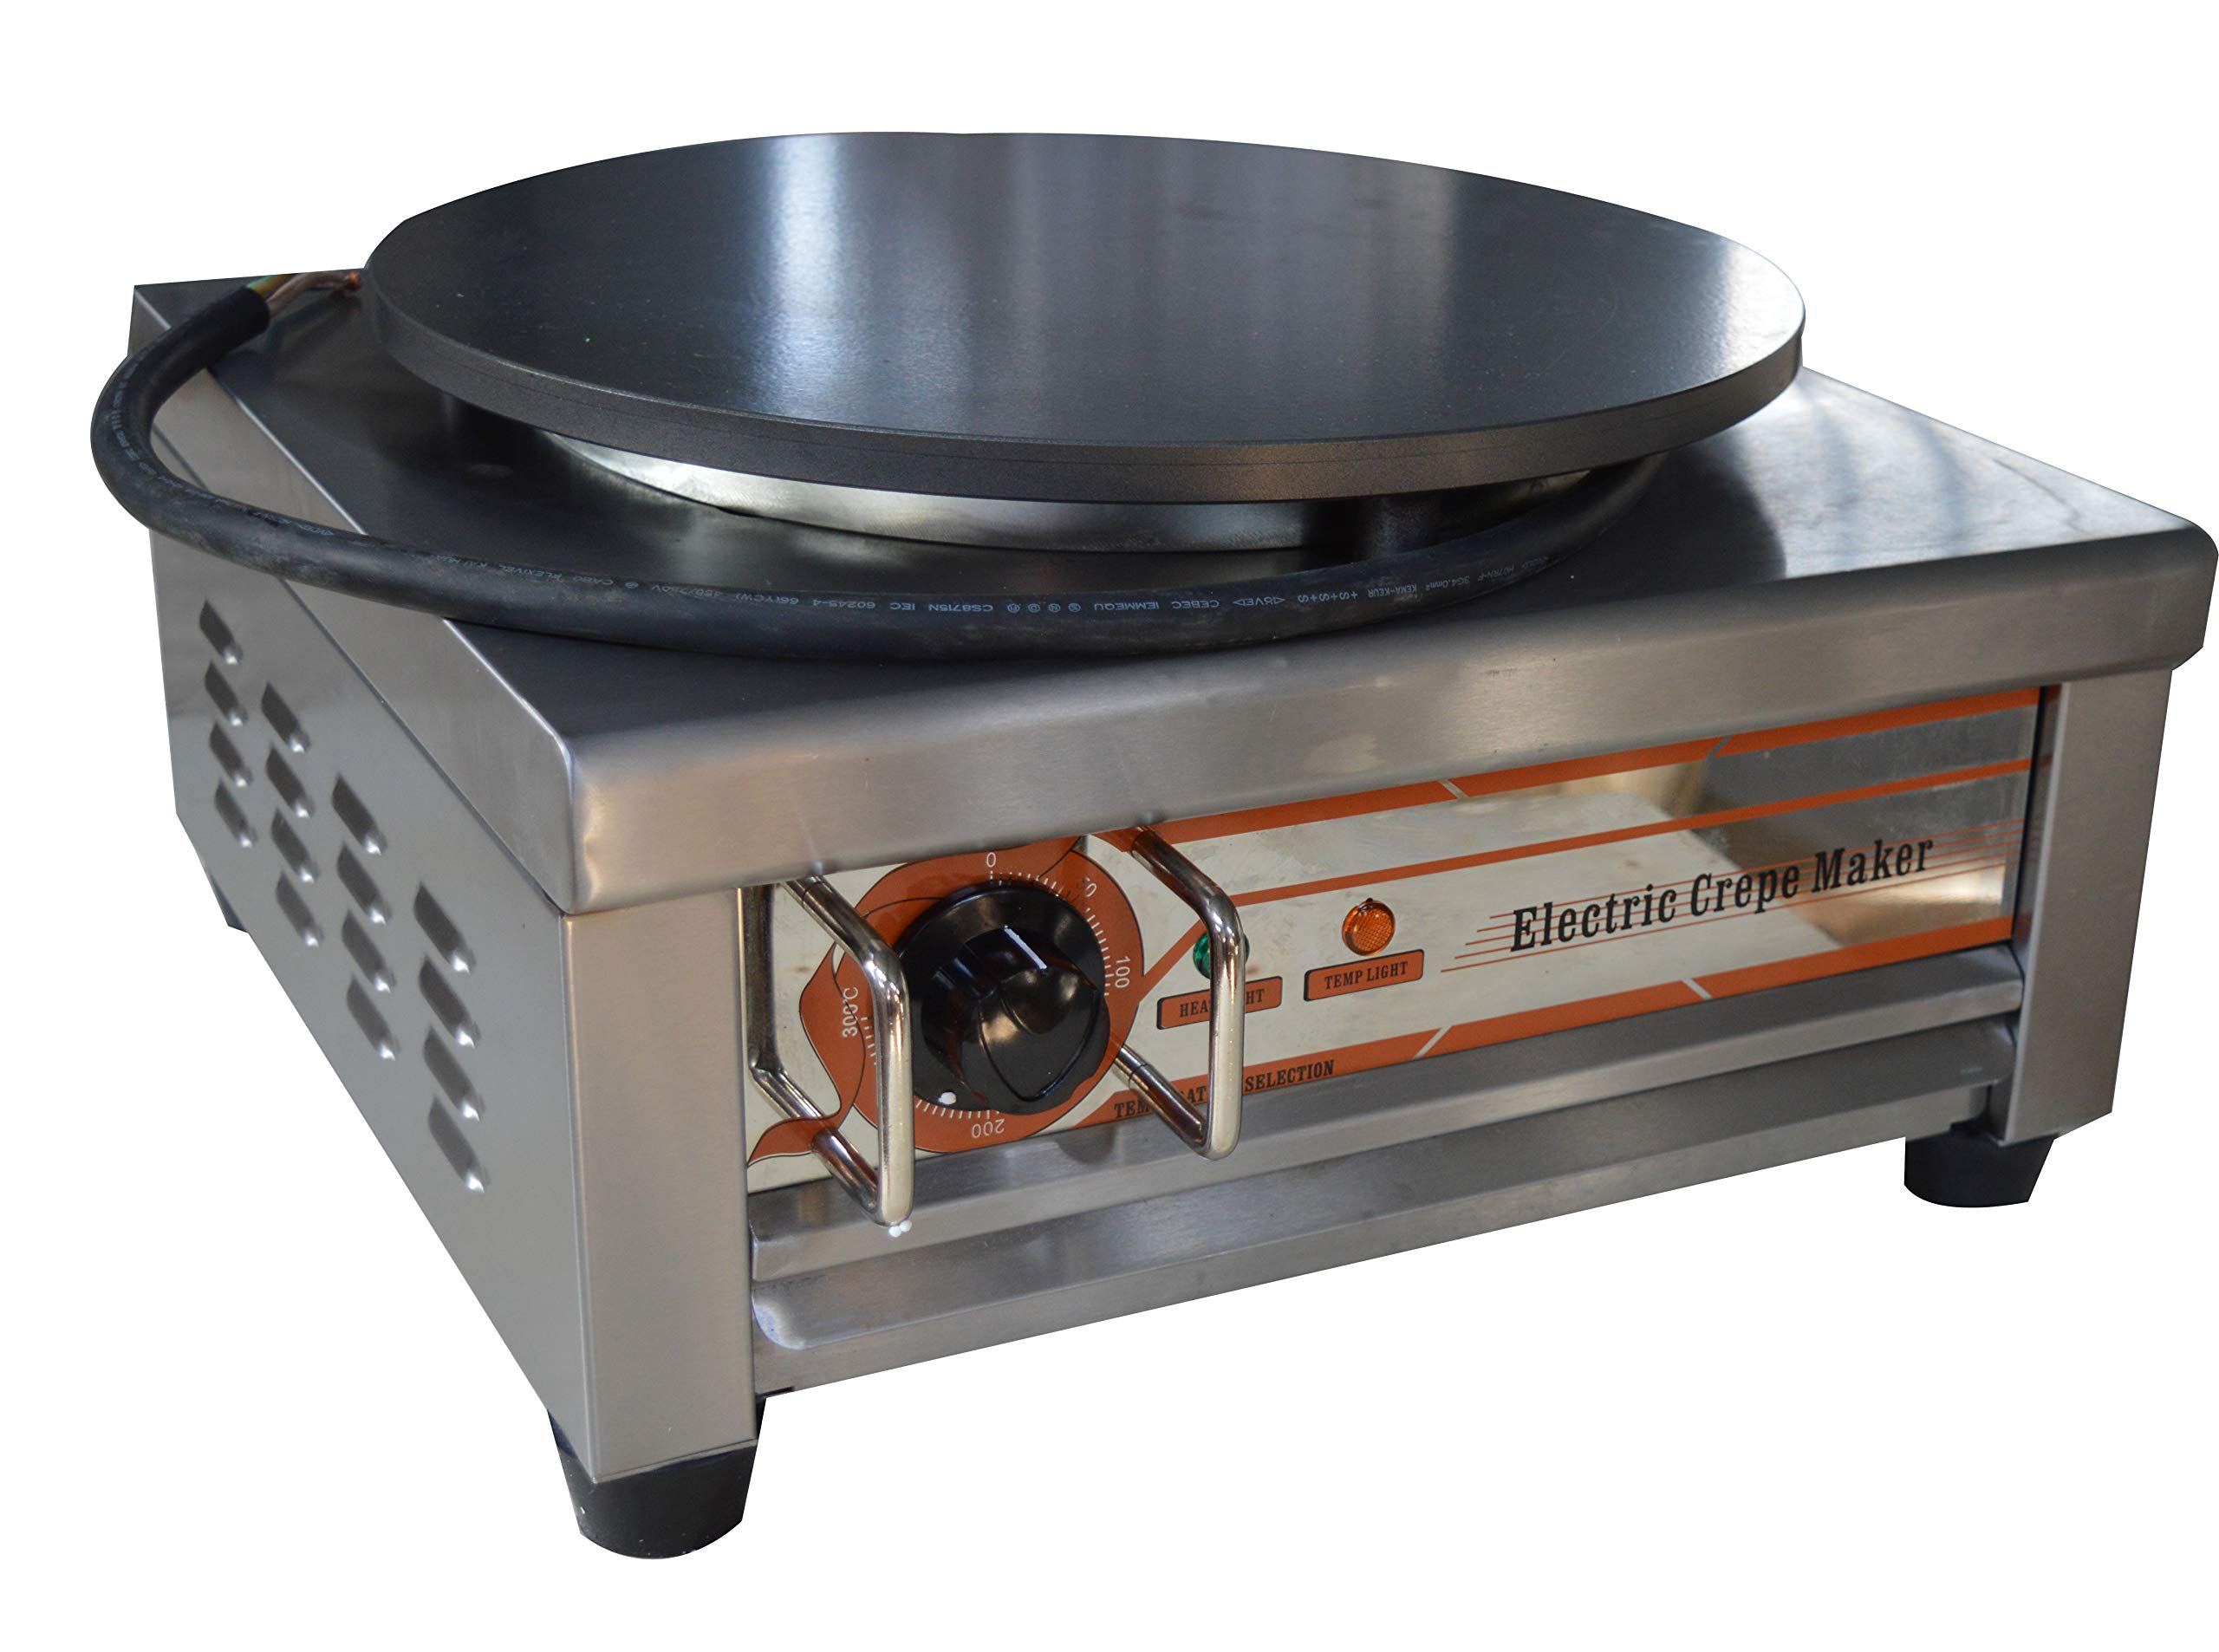 Techtongda Crepe Maker Machine Pancake Griddle Commercial Electric Kitchen 110V 2.6KW by TECHTONGDA